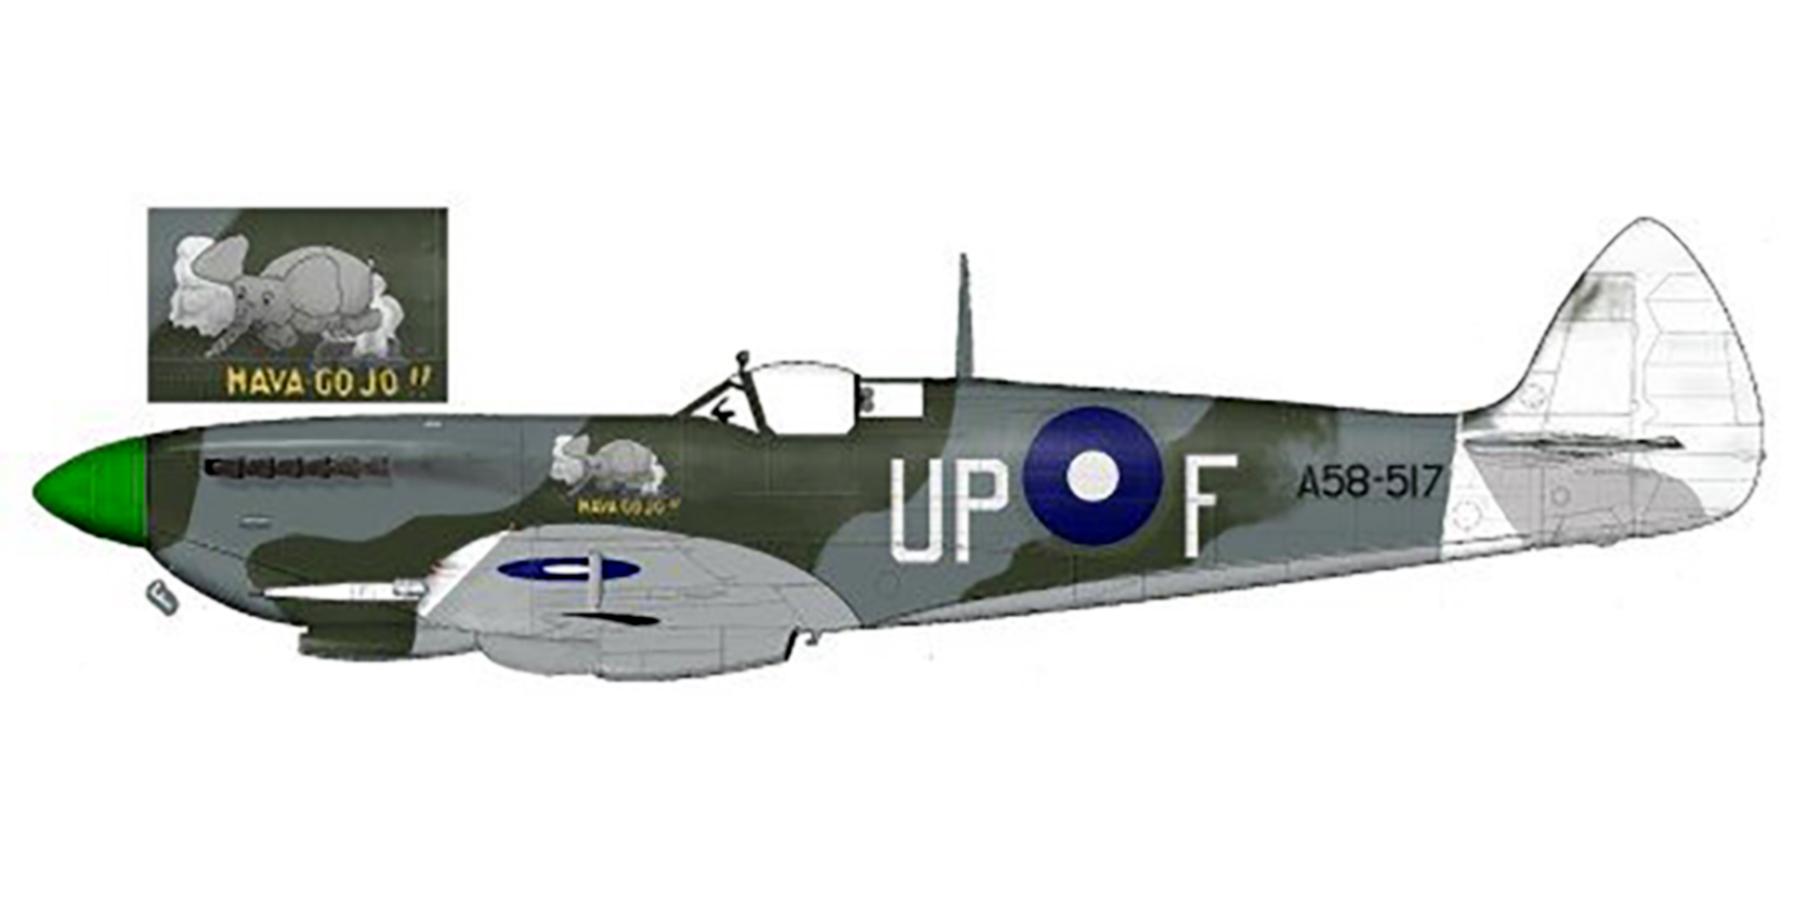 Spitfire LFVIII RAAF 79Sqn UPF Norman Smithell A58 517 Morotai 1945 0A